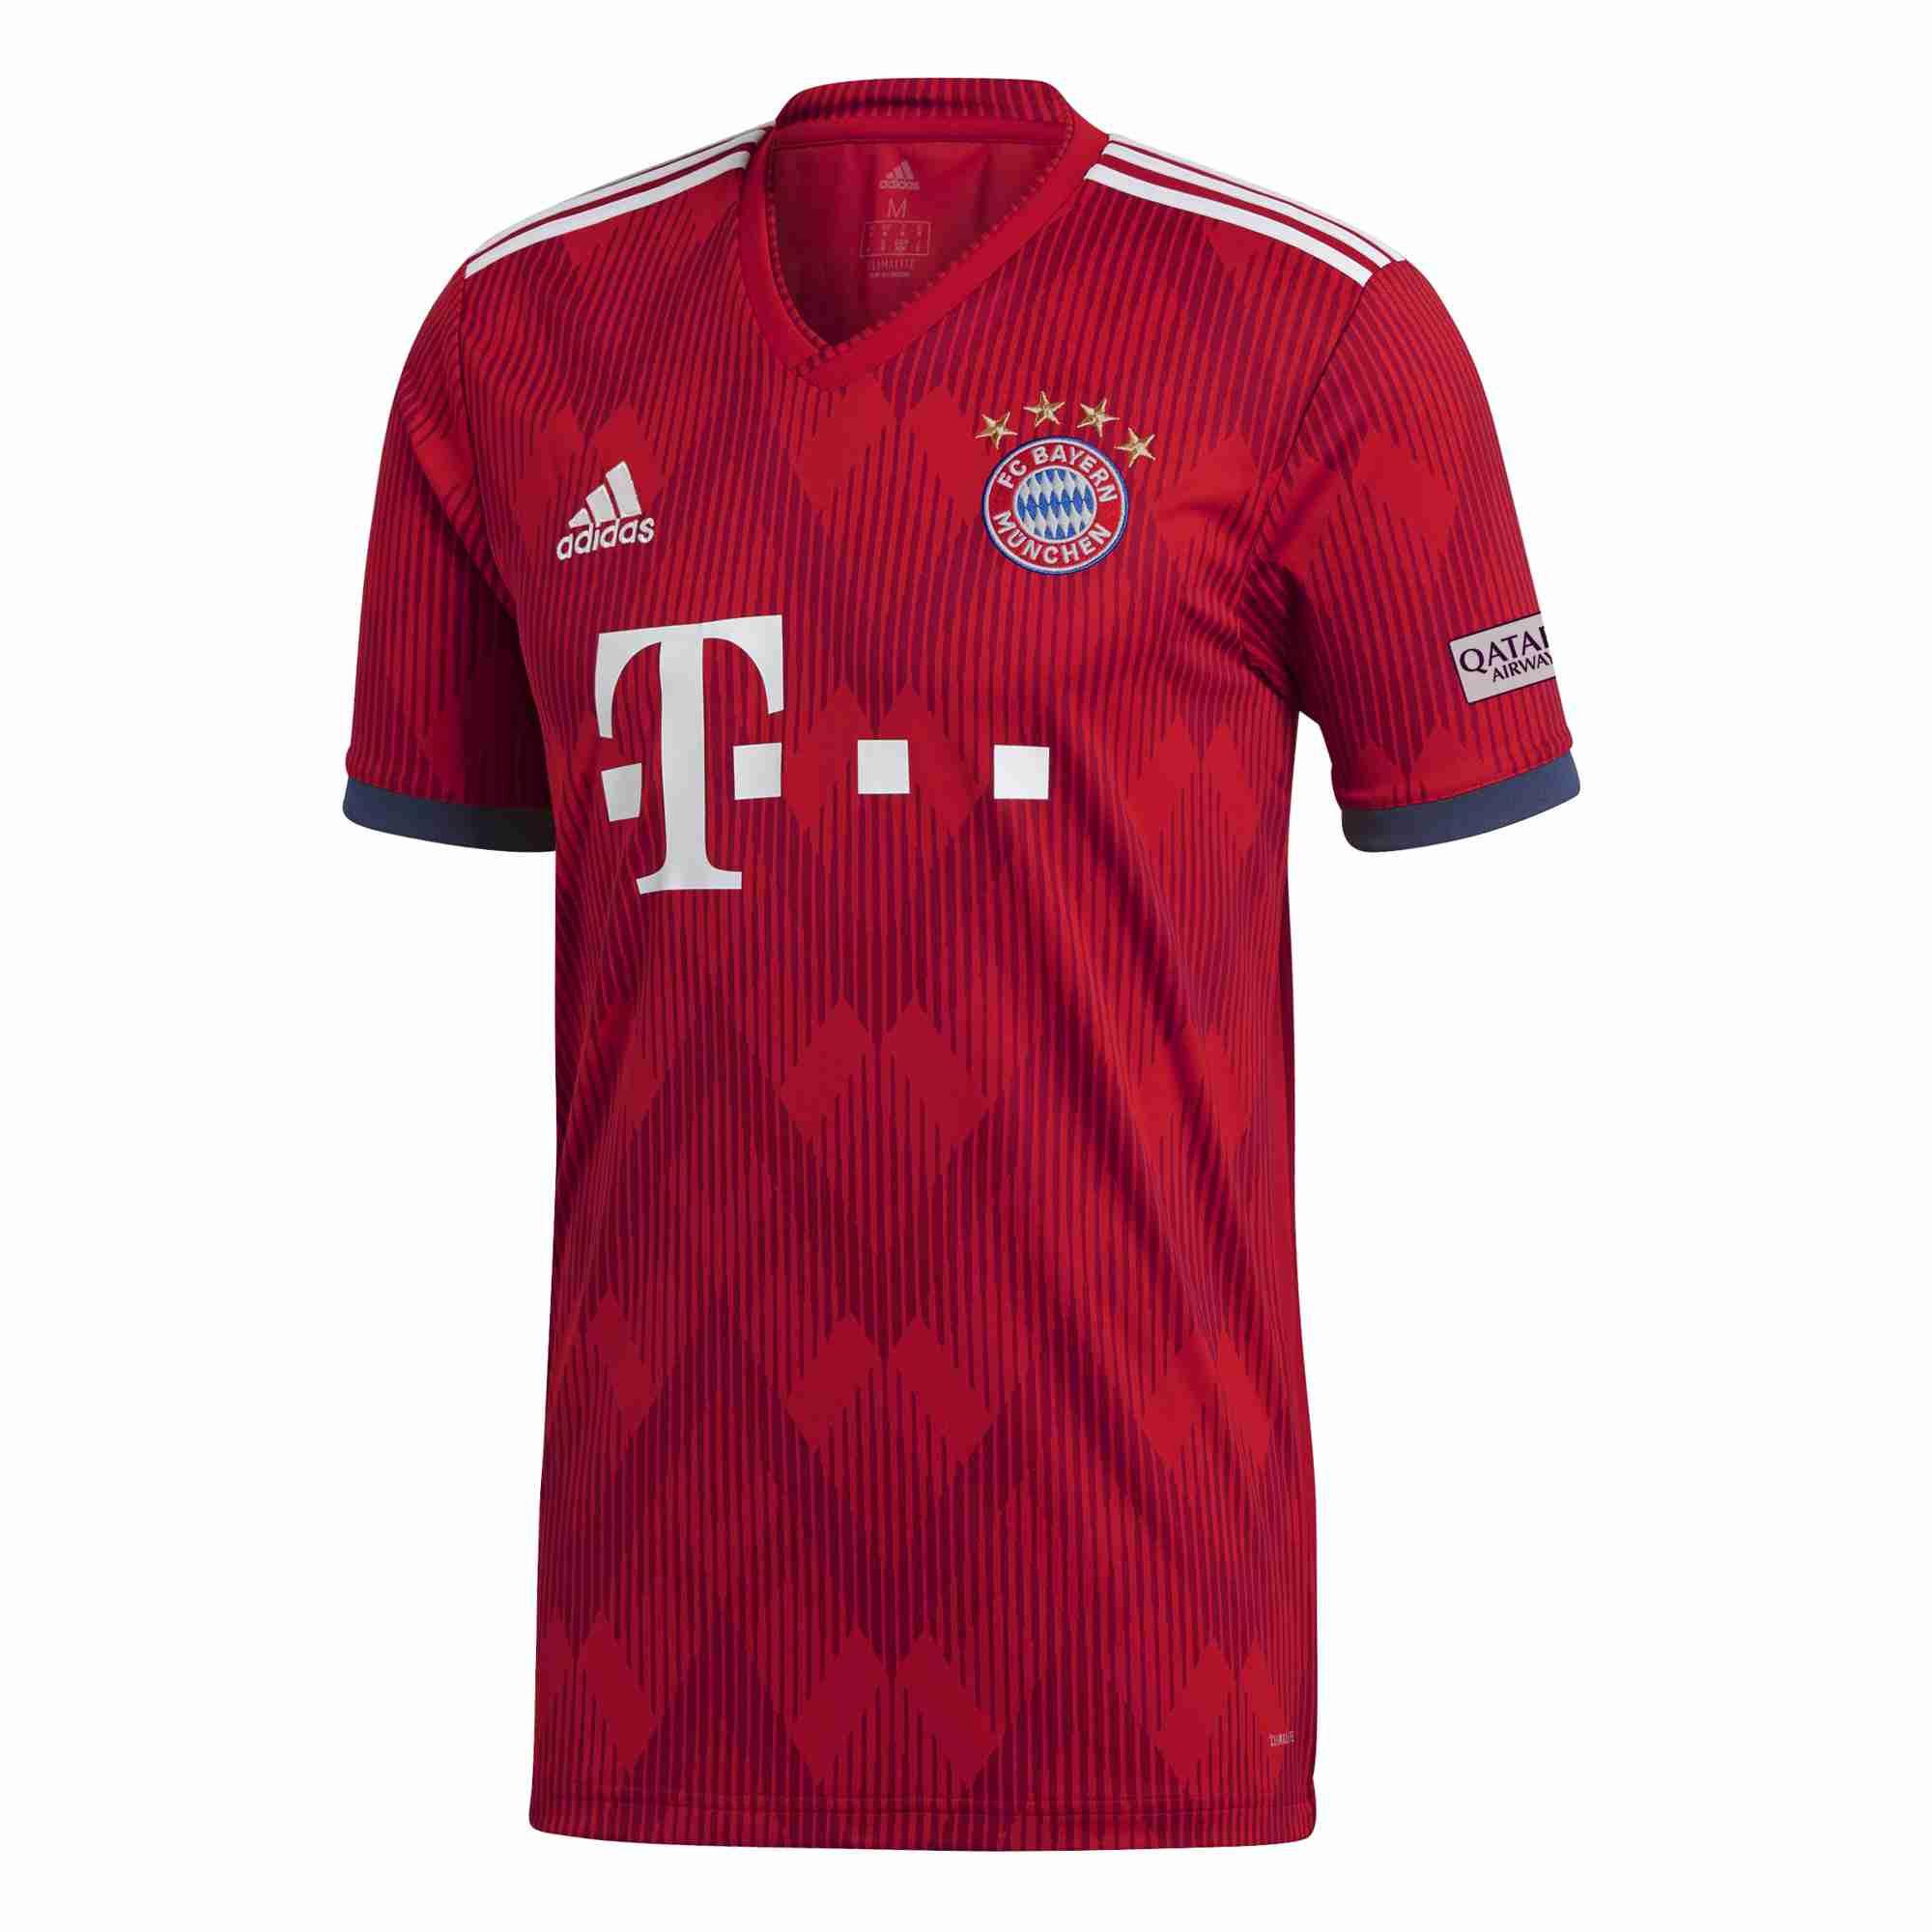 a0ab42084ba45e Nowość Koszulka Adidas Bayern Monachium 2018/19 S - 7616462226 ...